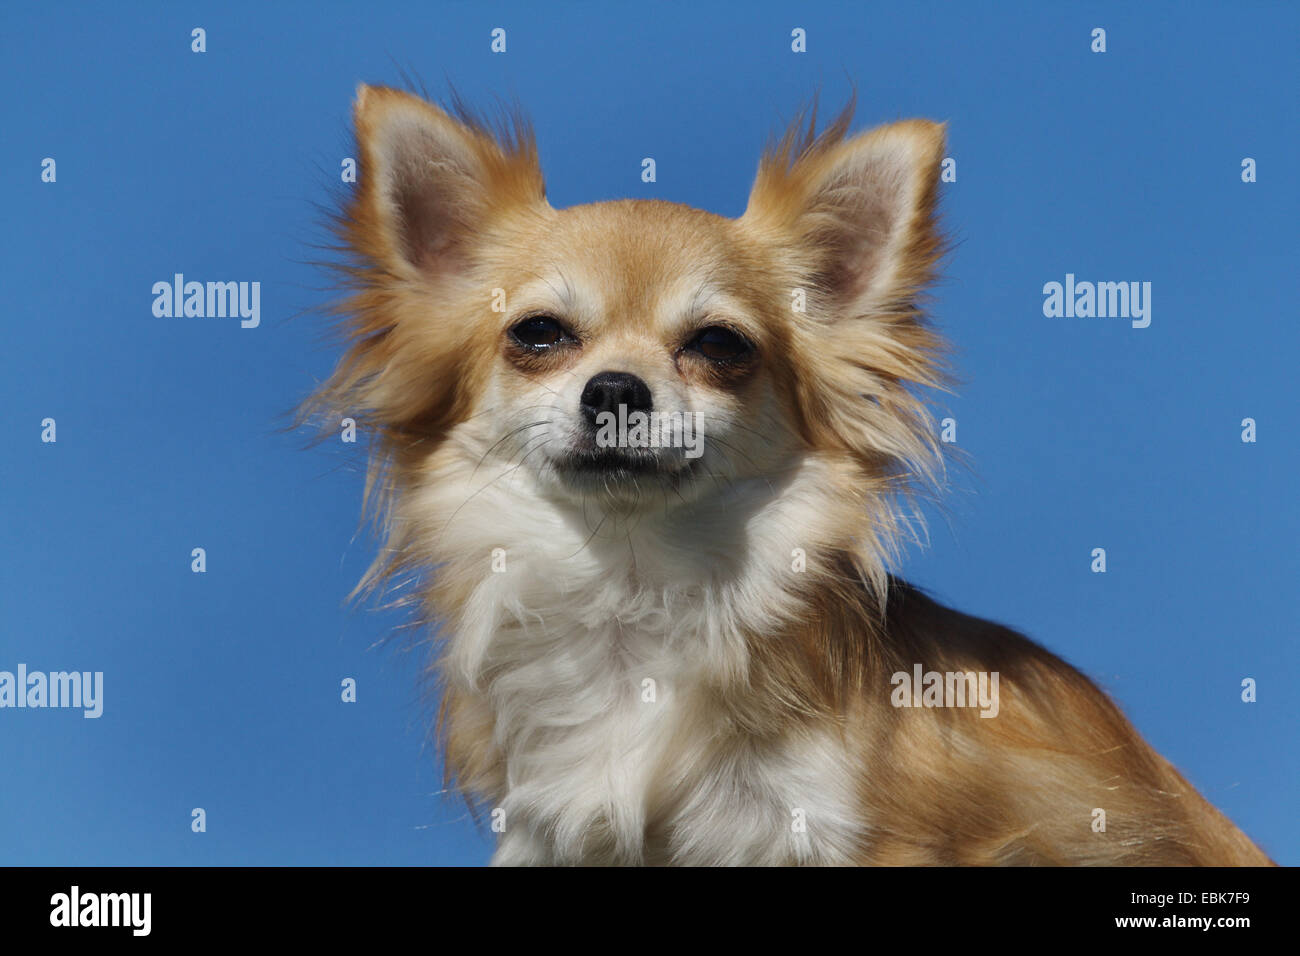 Chihuahua (Canis lupus f. familiaris), portrait - Stock Image